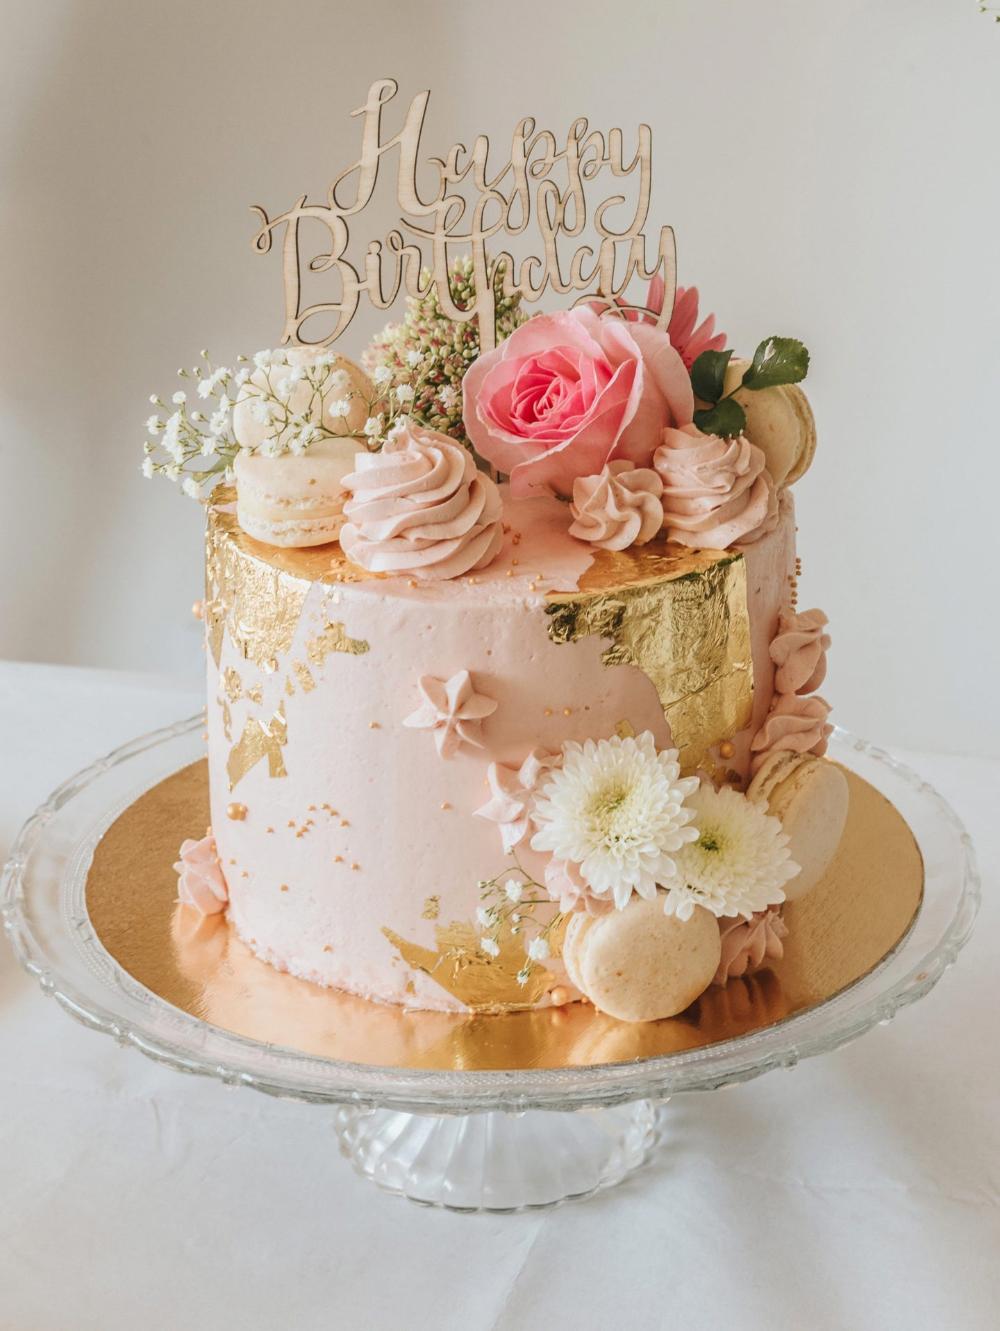 Salmon And Mozzarella Cake Clean Eating Snacks Recipe Birthday Cake For Mom Birthday Cake For Women Simple Pretty Birthday Cakes